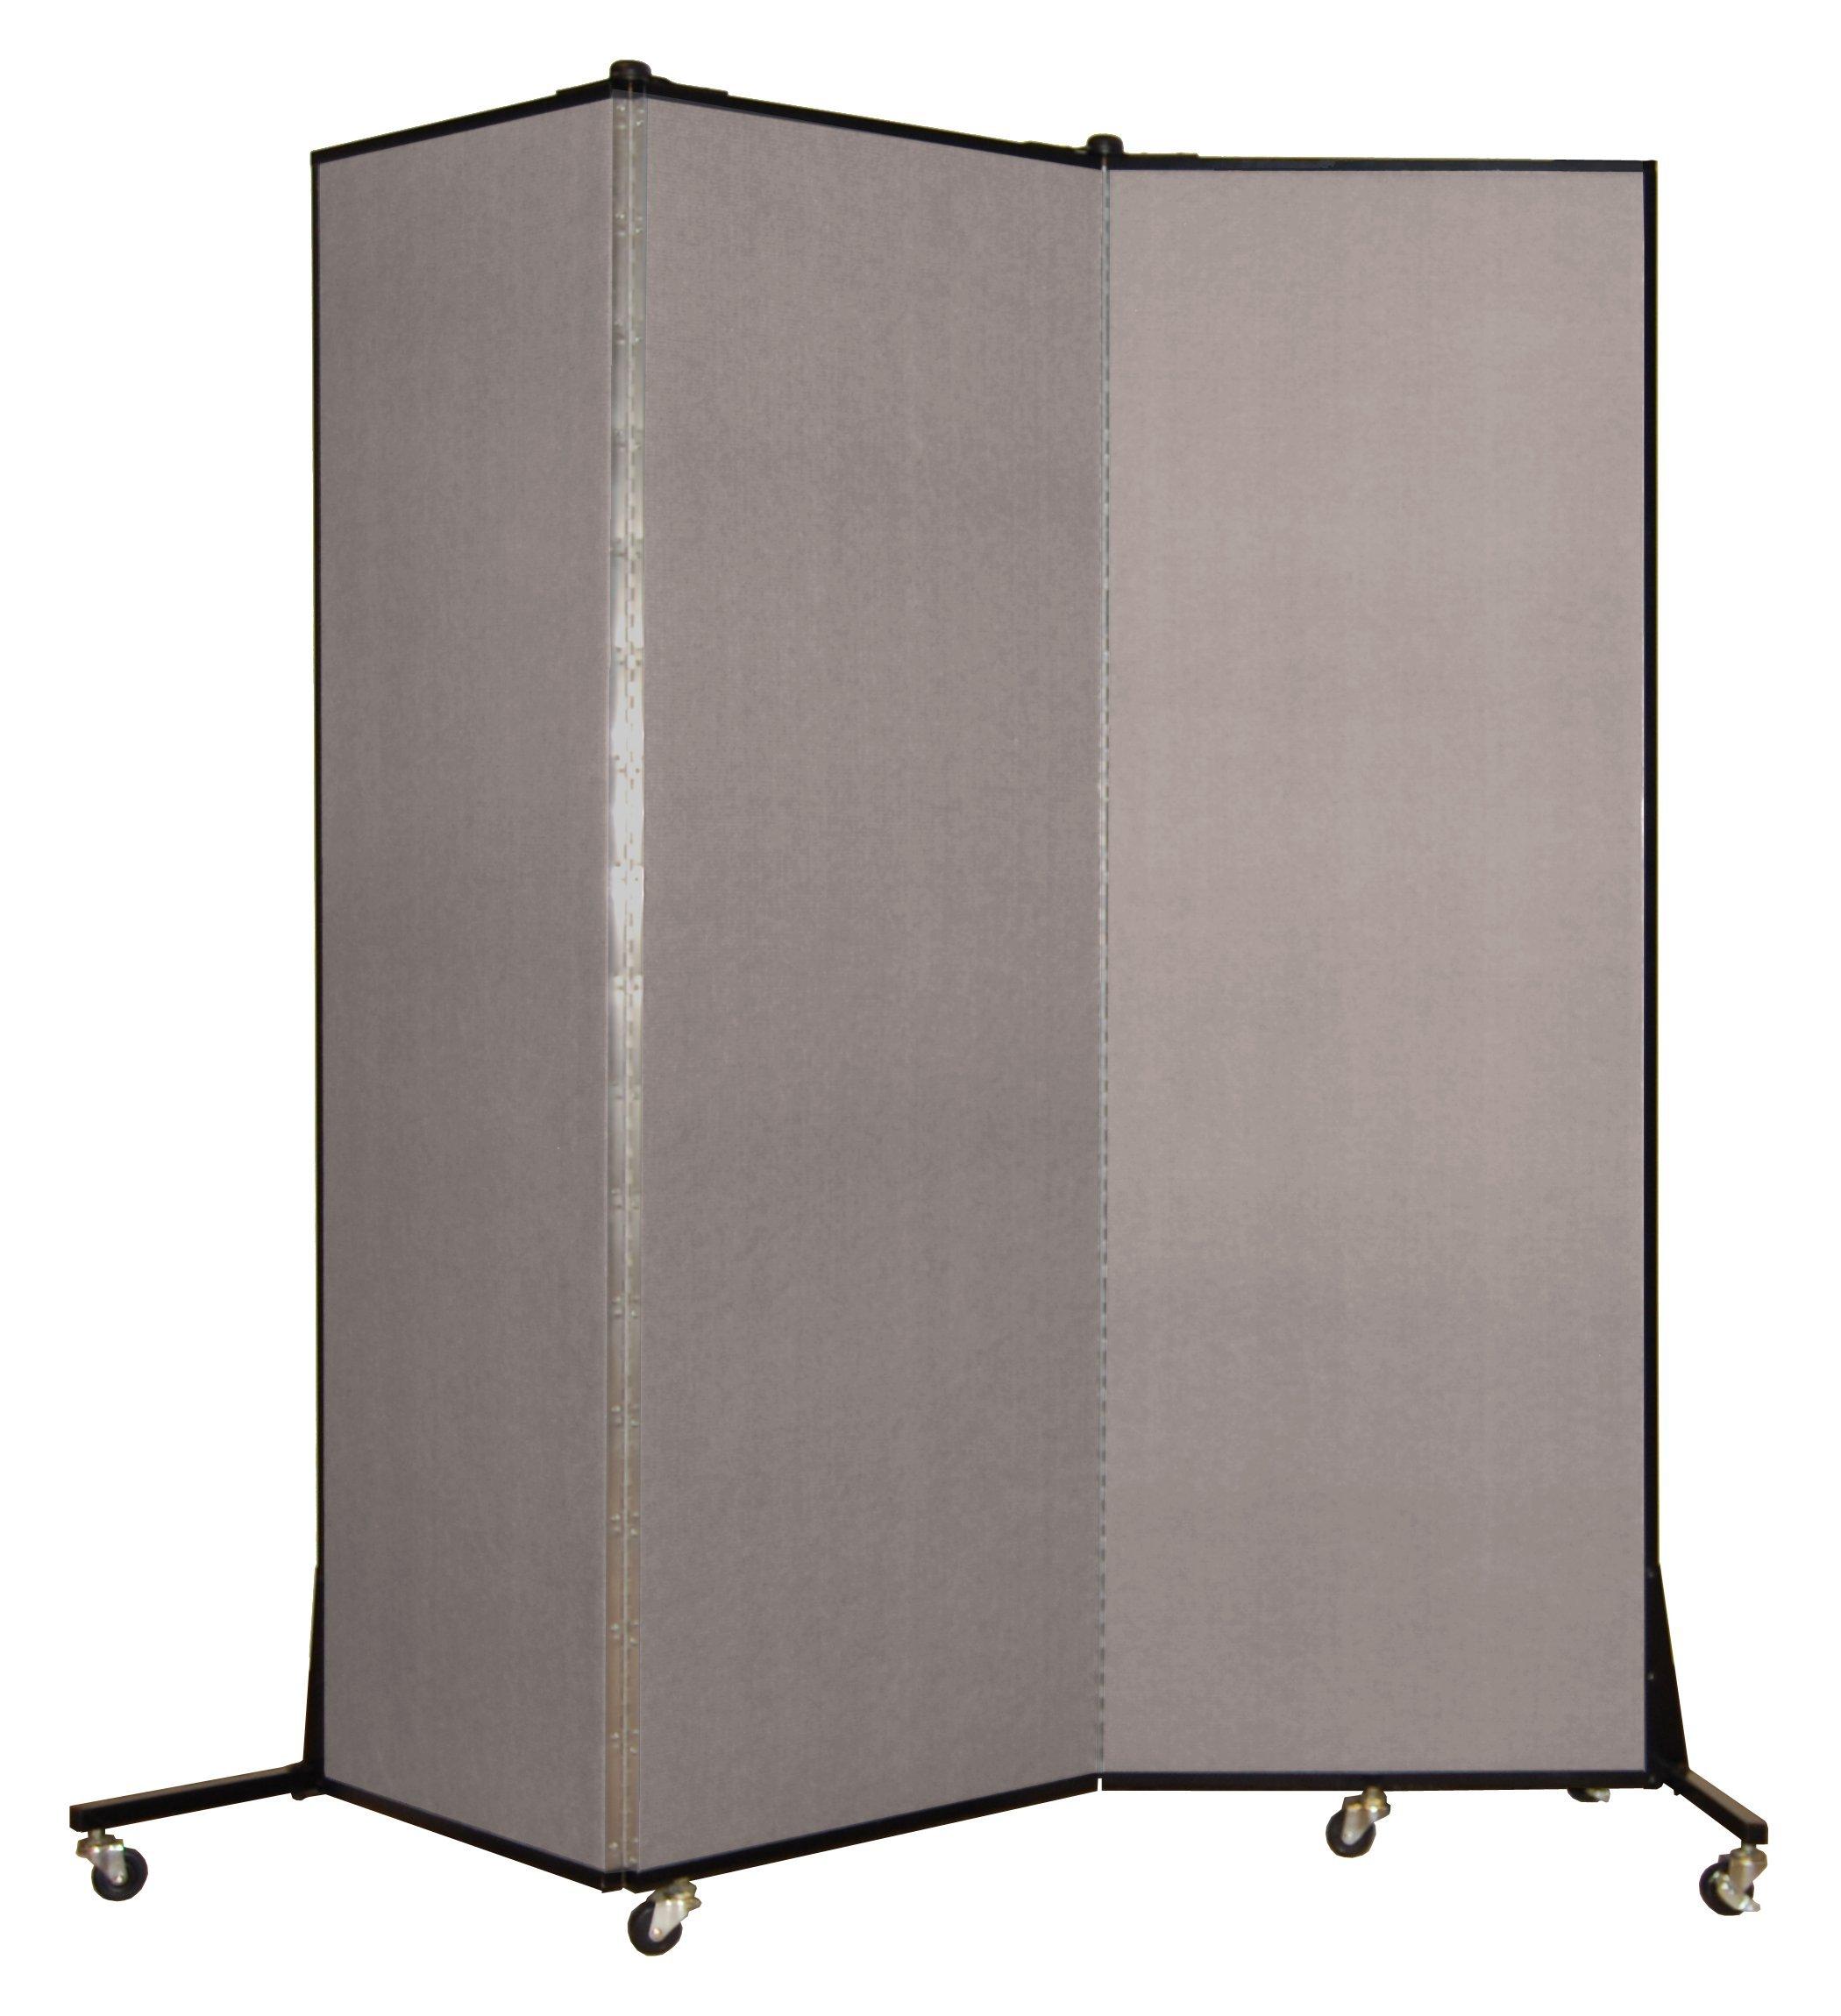 Screenflex BFSL683-BG Light Duty Portable Room Divider, 3 Panels